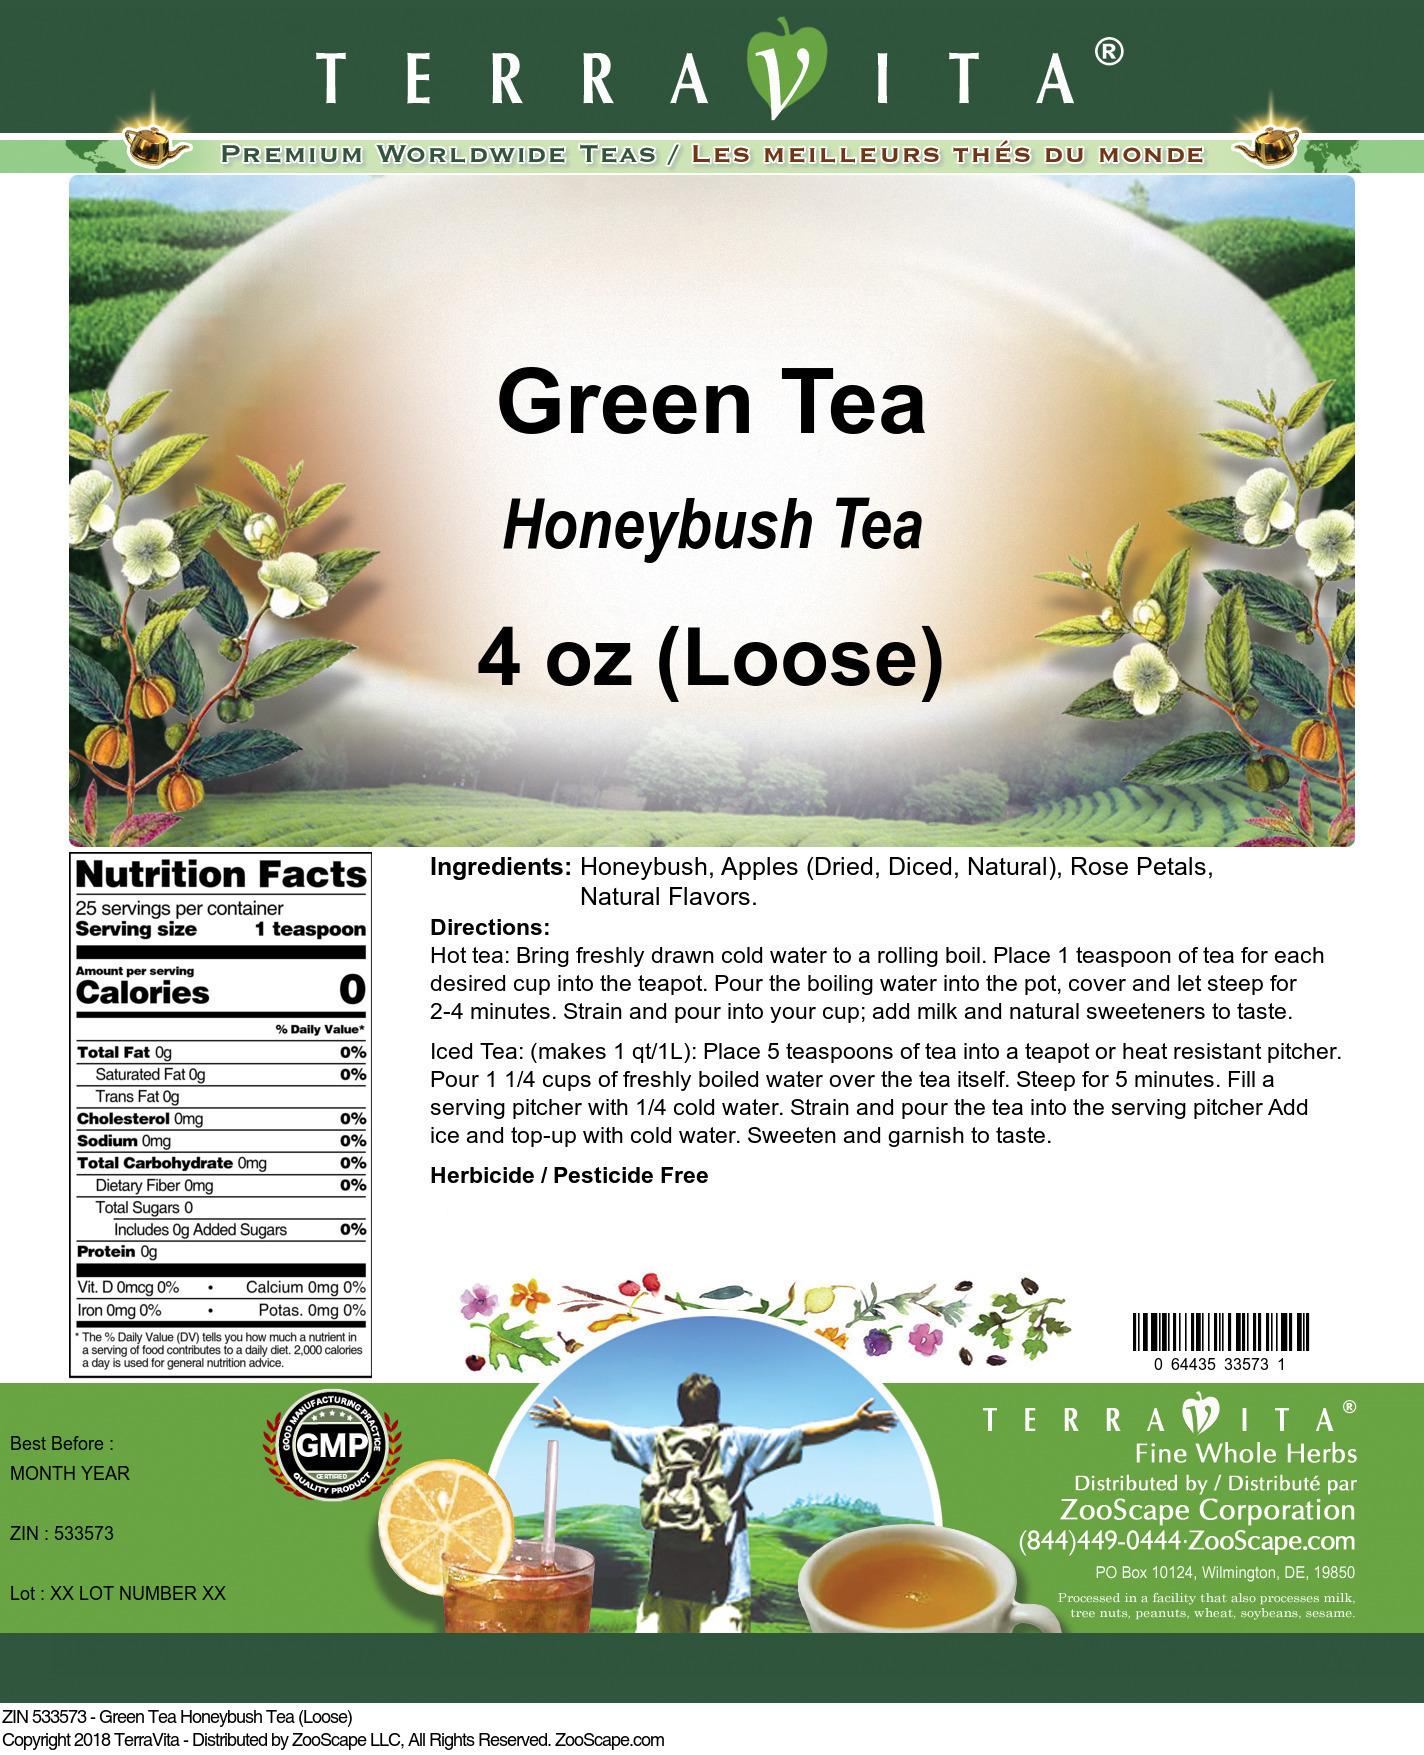 Green Tea Honeybush Tea (Loose)